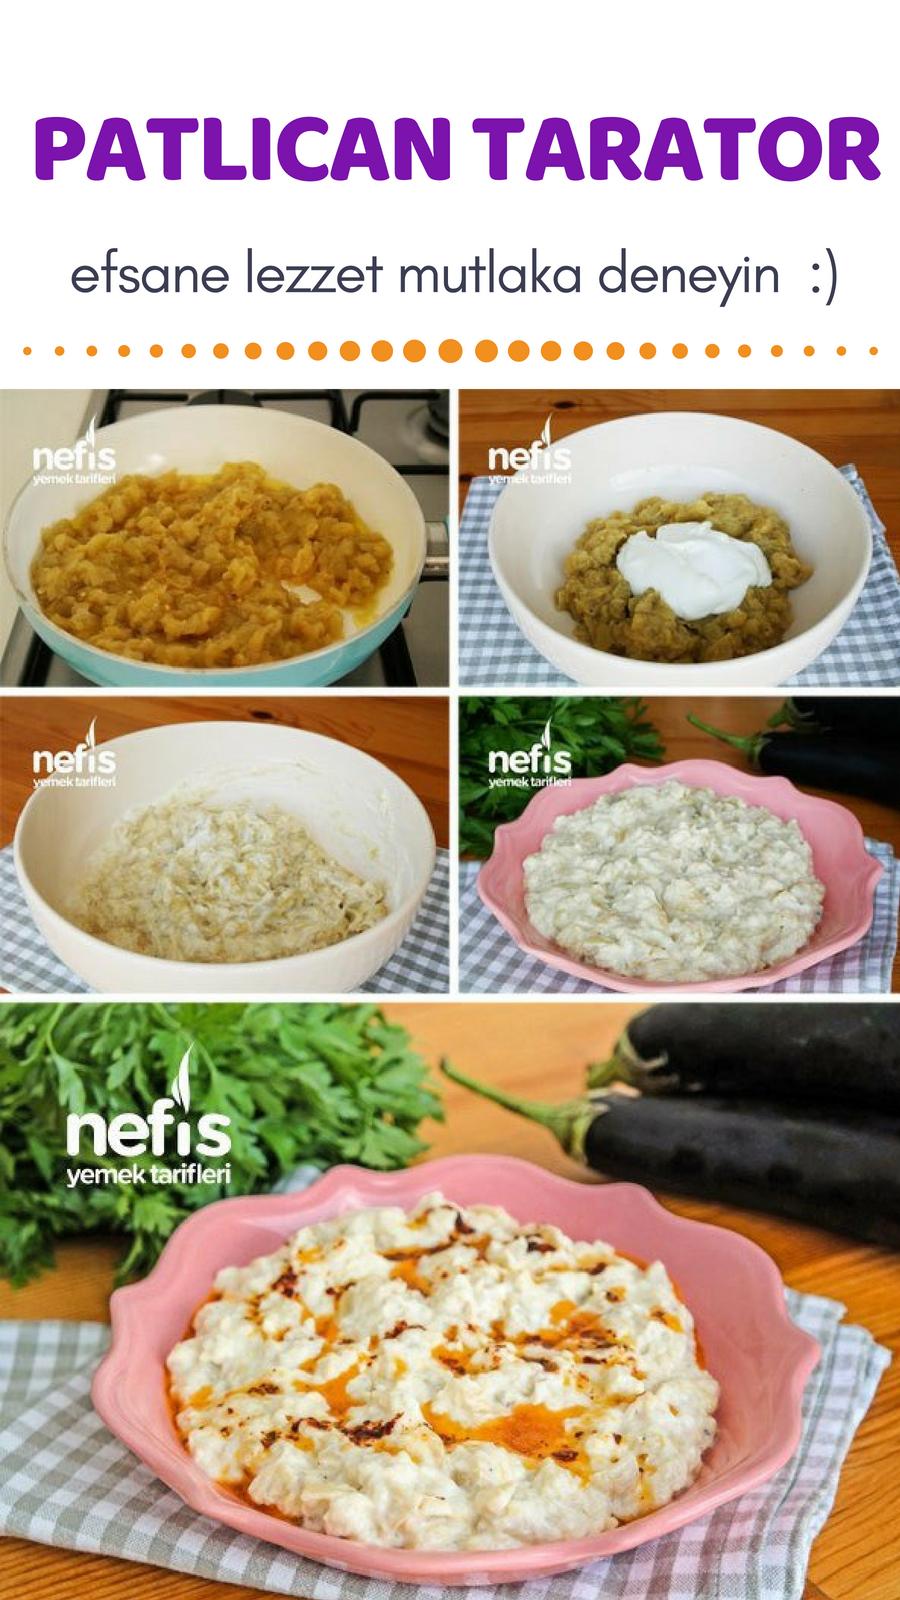 Patlıcanlı Pide Tarifi Videosu